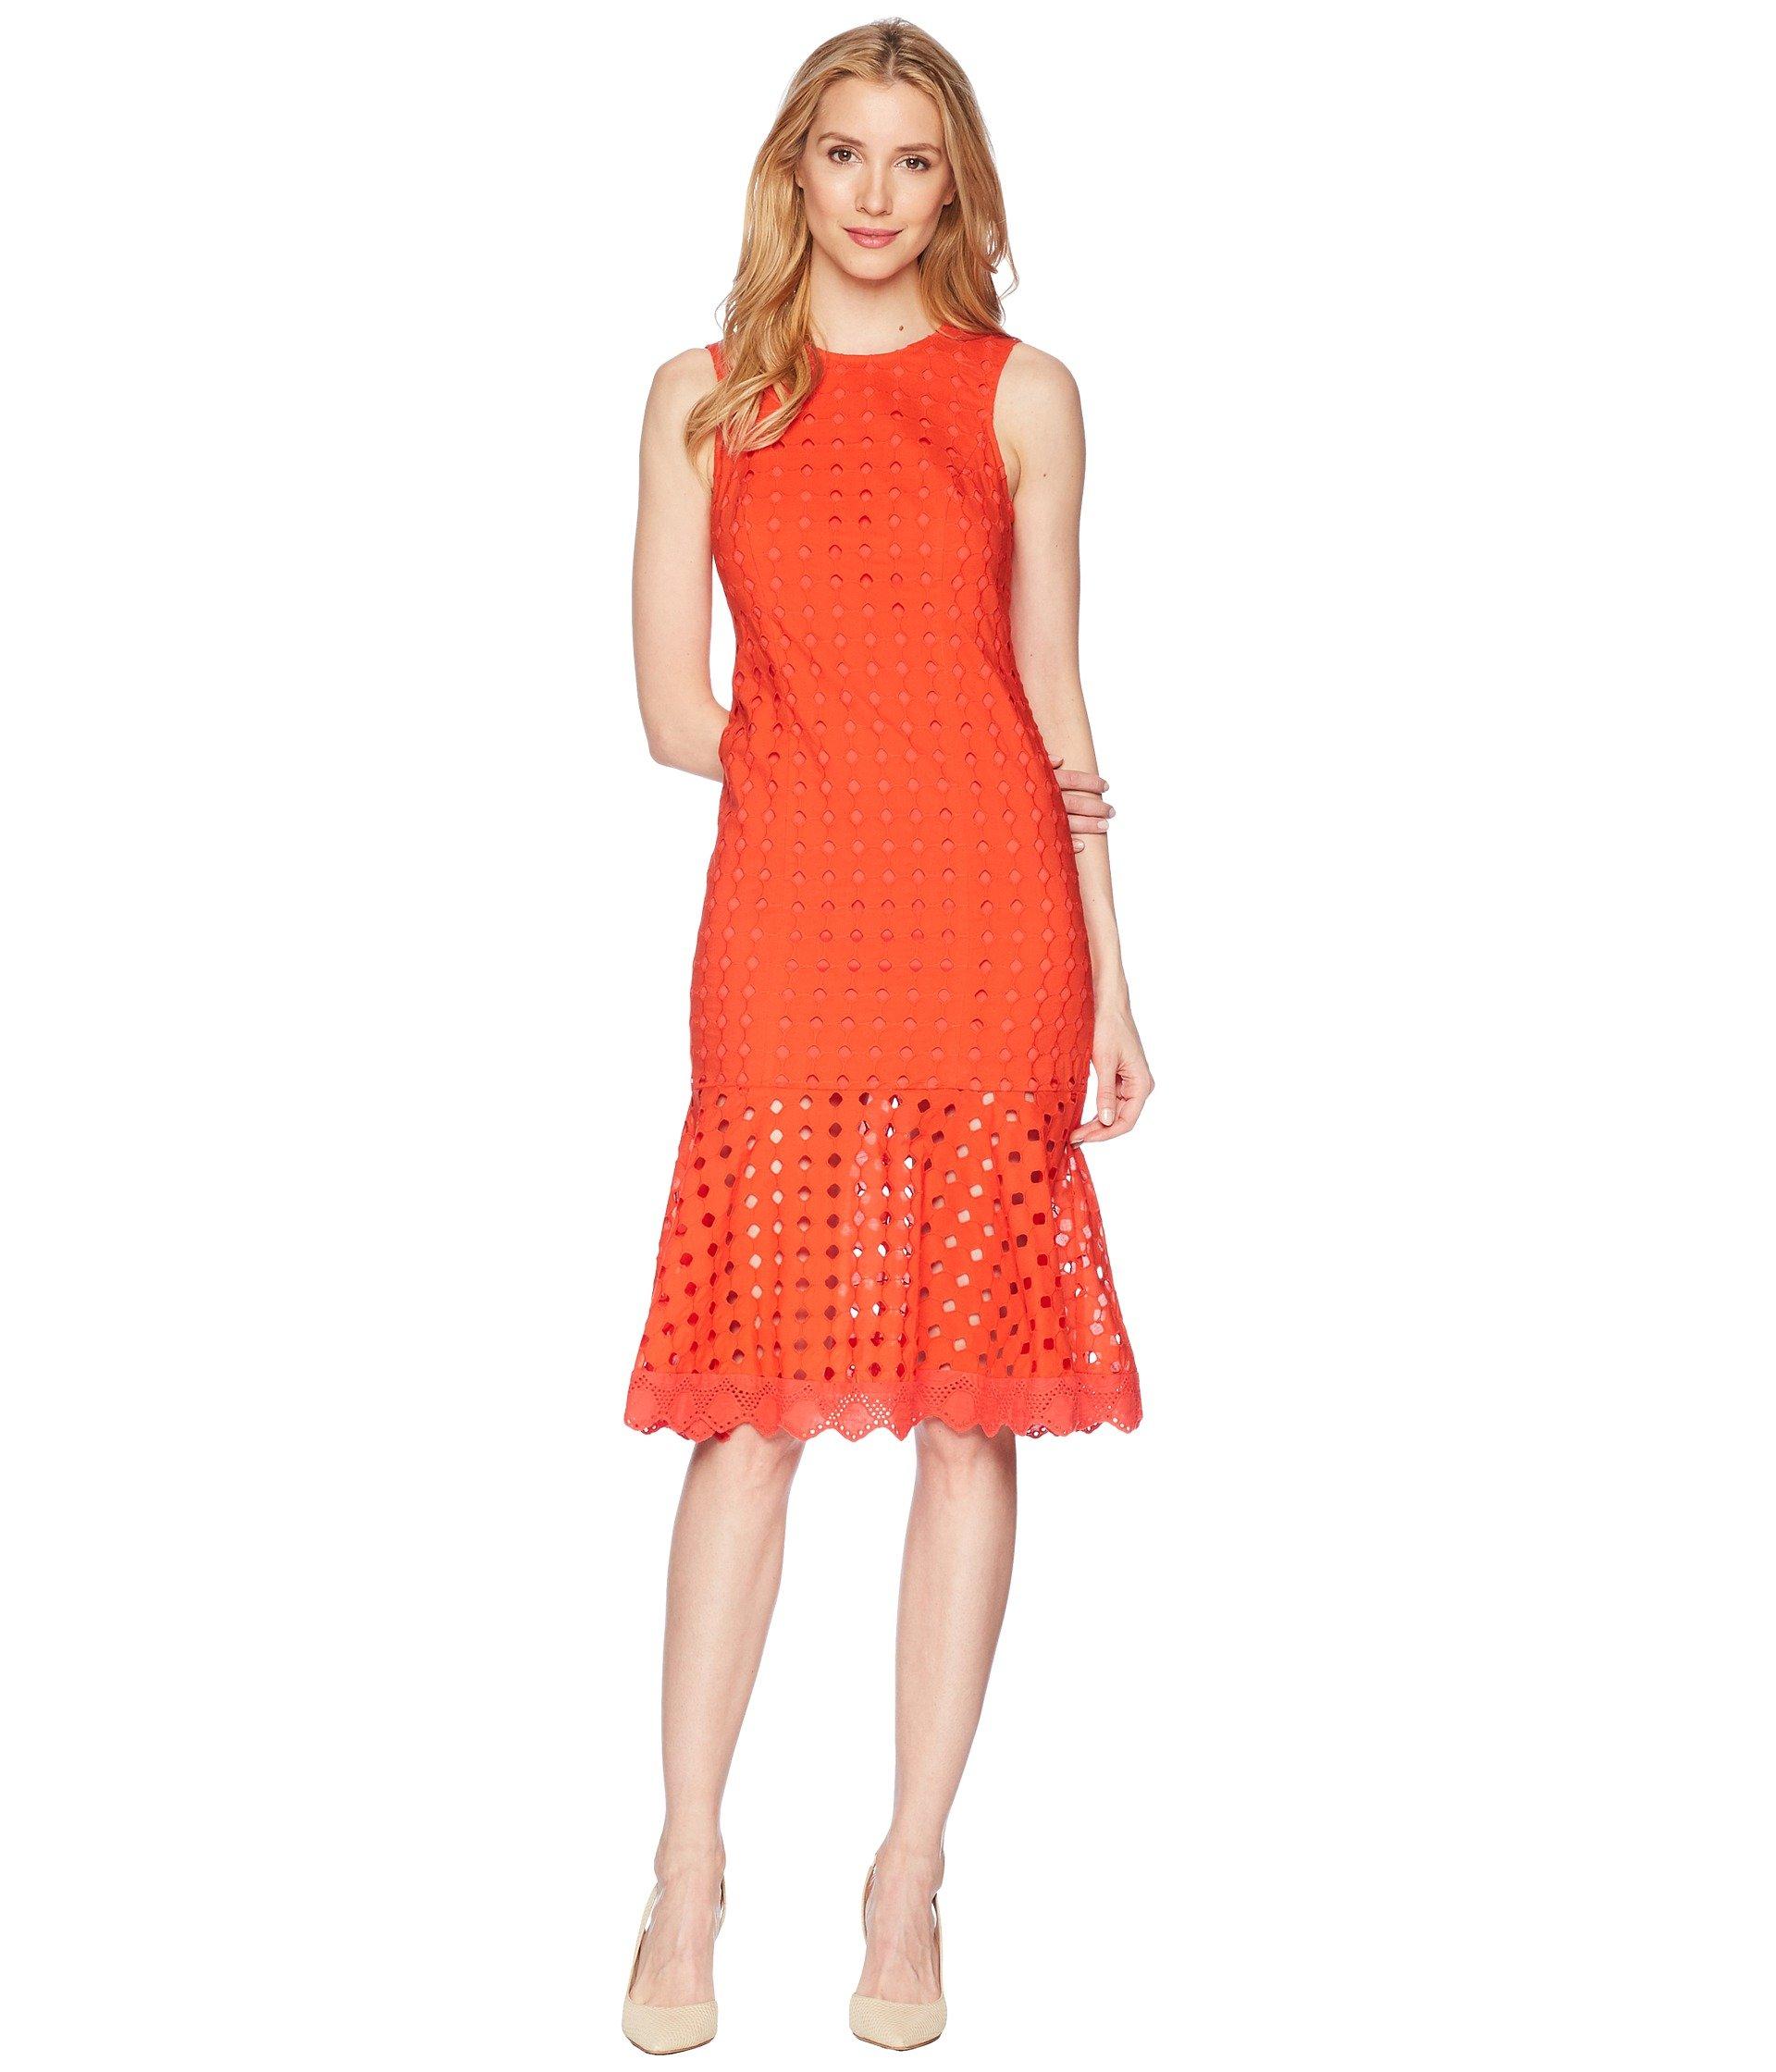 Donna Morgan Women's Sleeveless Eyelet Drop-Waist Dress, Tomato Red, 14